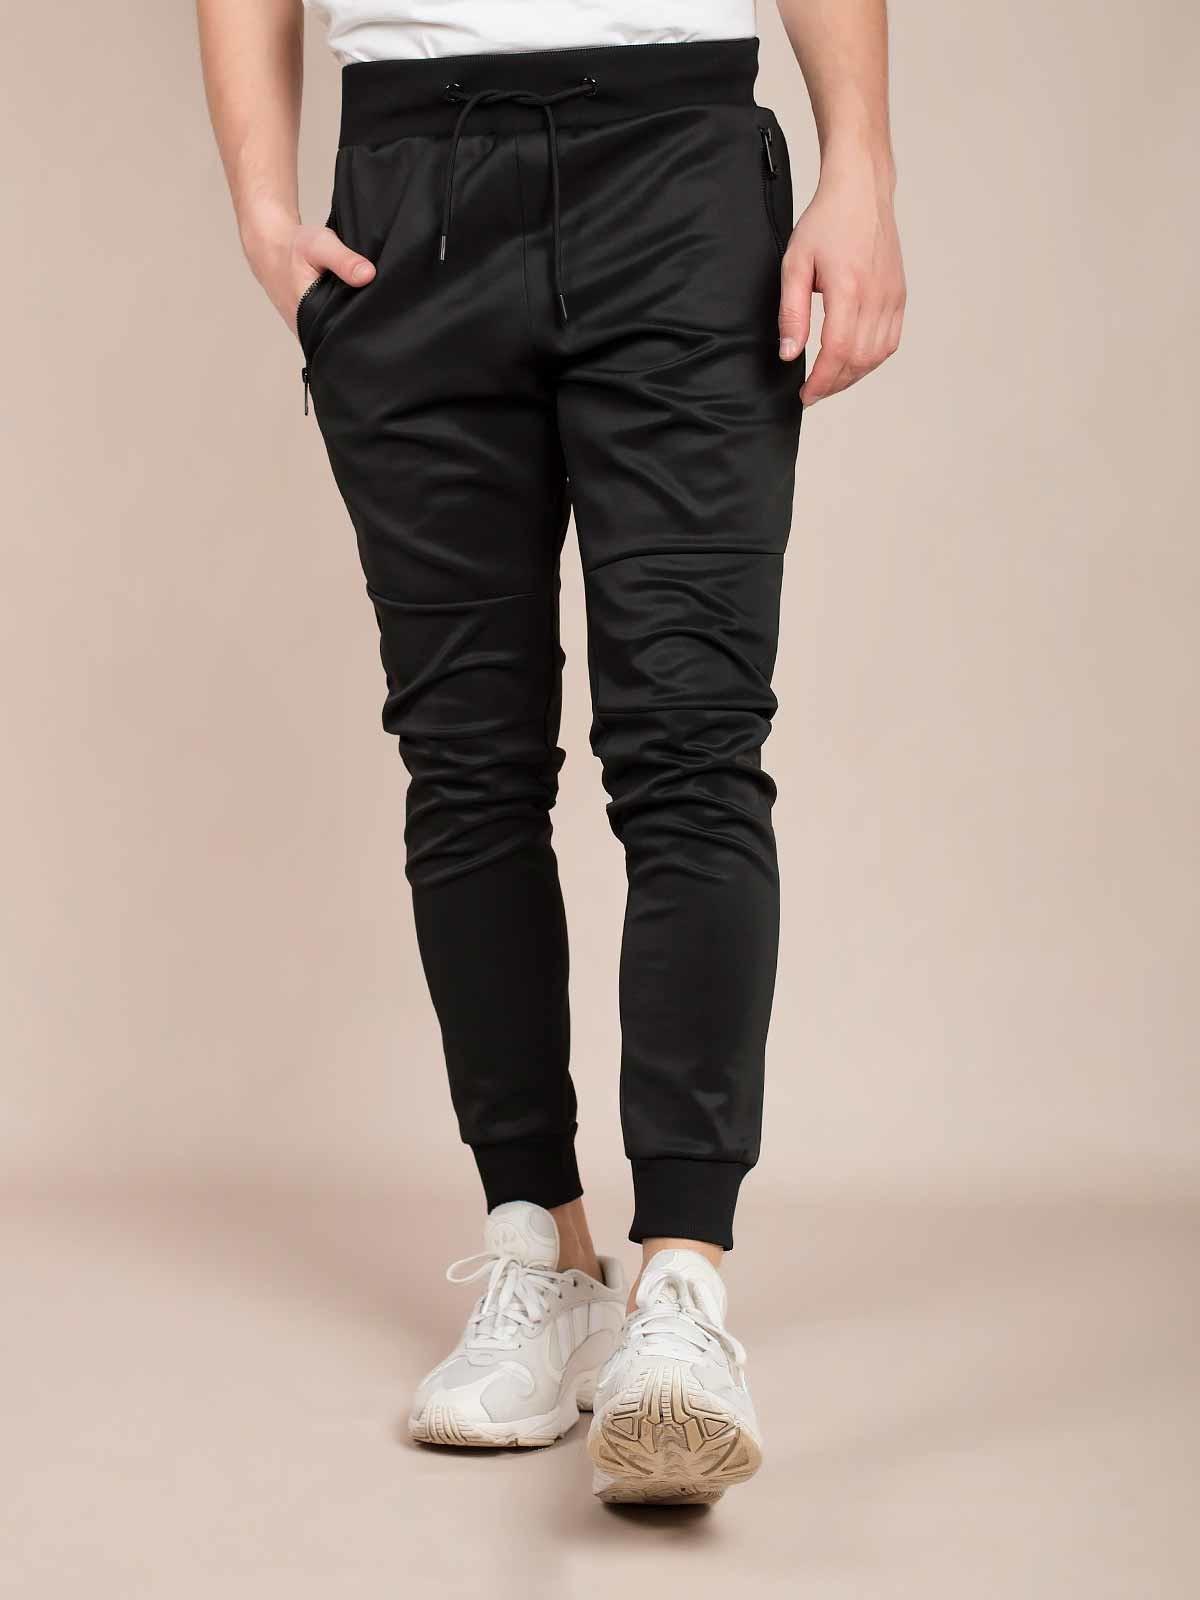 Pantalones de chándal lisos brillantes